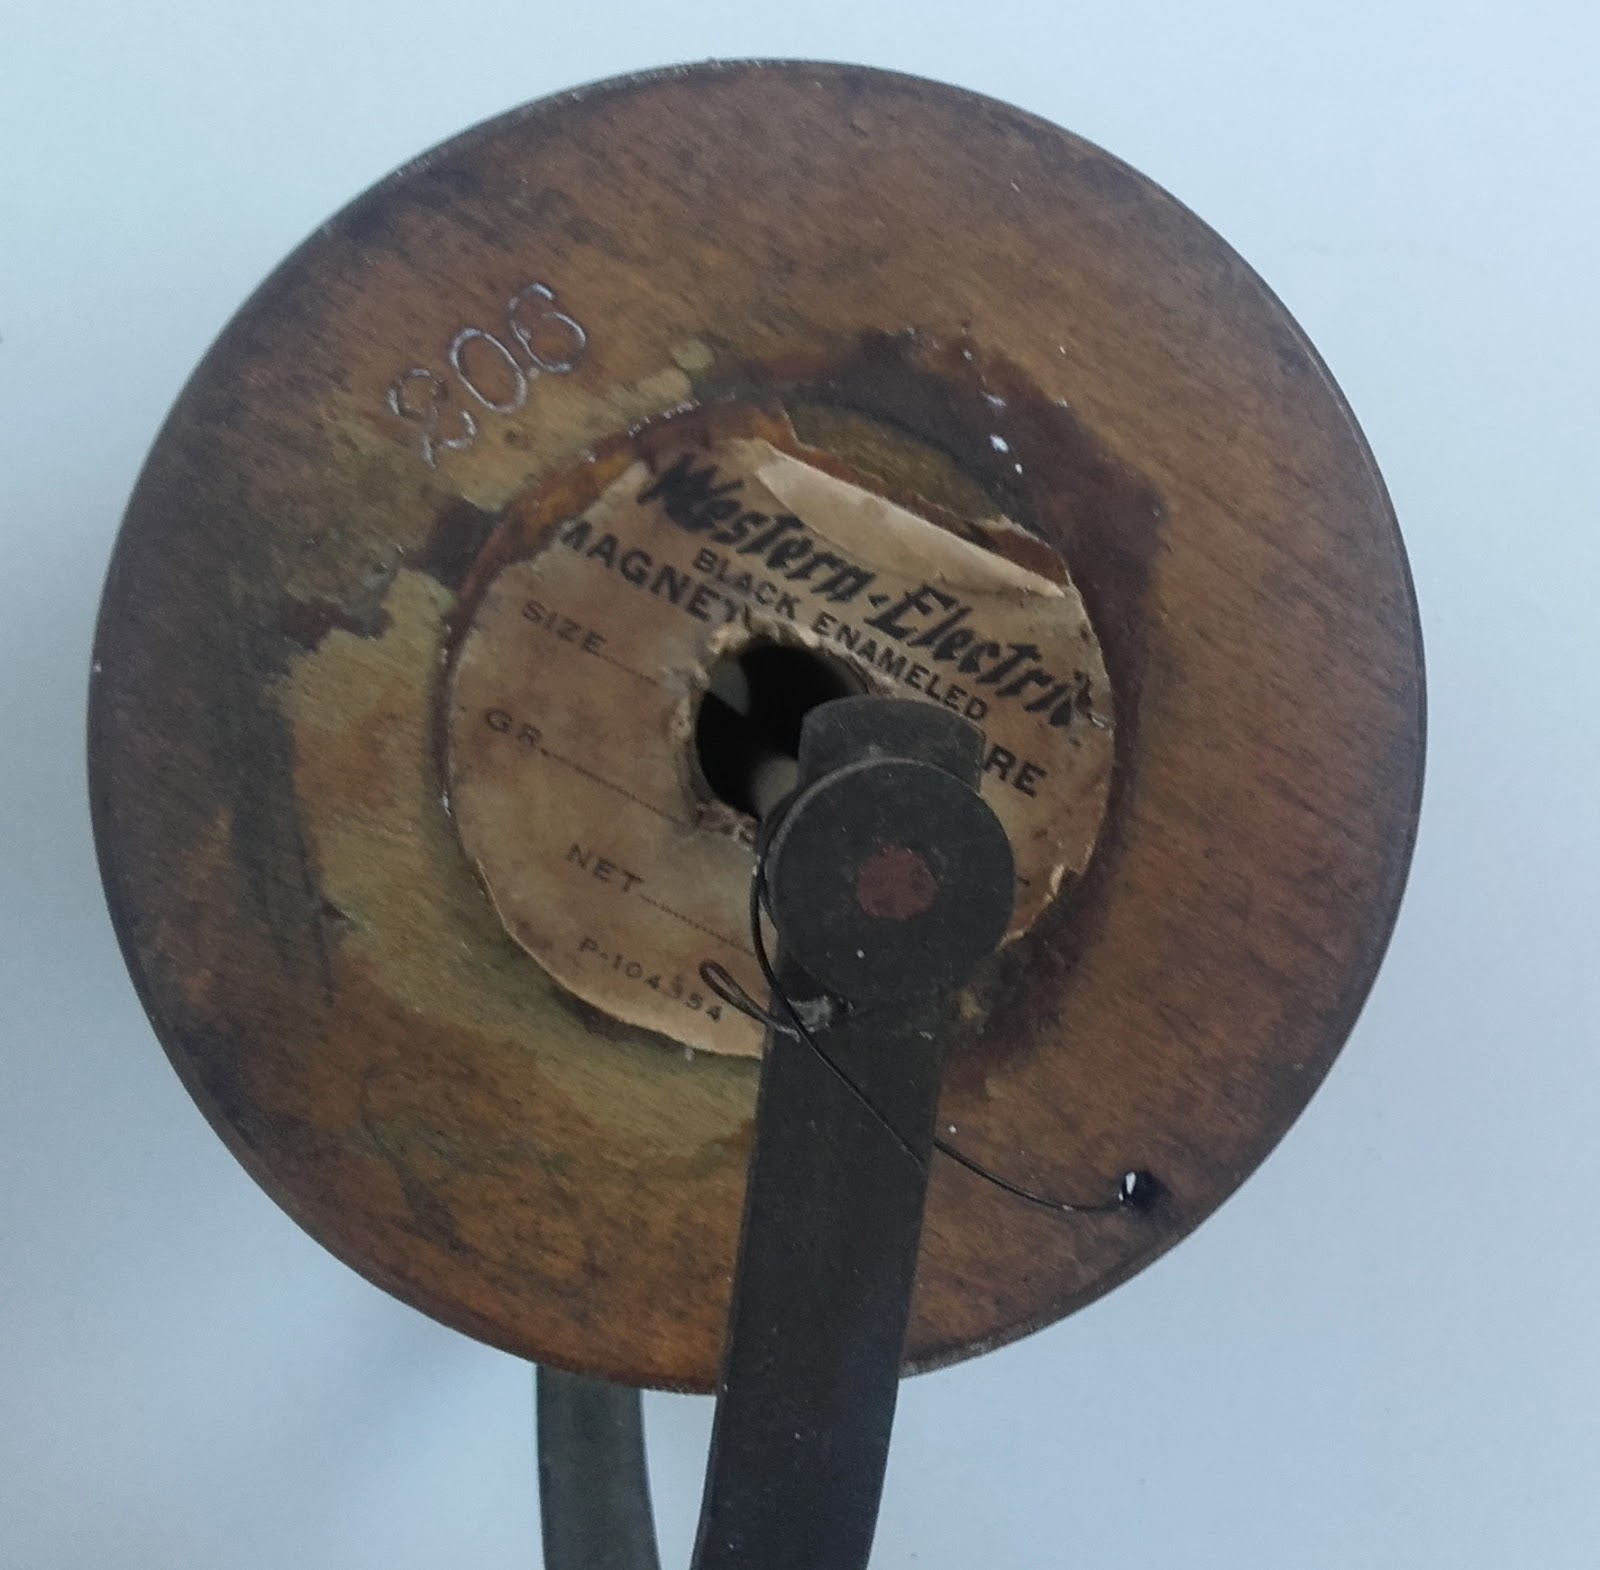 devidoir bobine fil electrique Ancien dévidoir bobine pour fil électrique , pied en laiton , bobine bois.  Western Electric Company